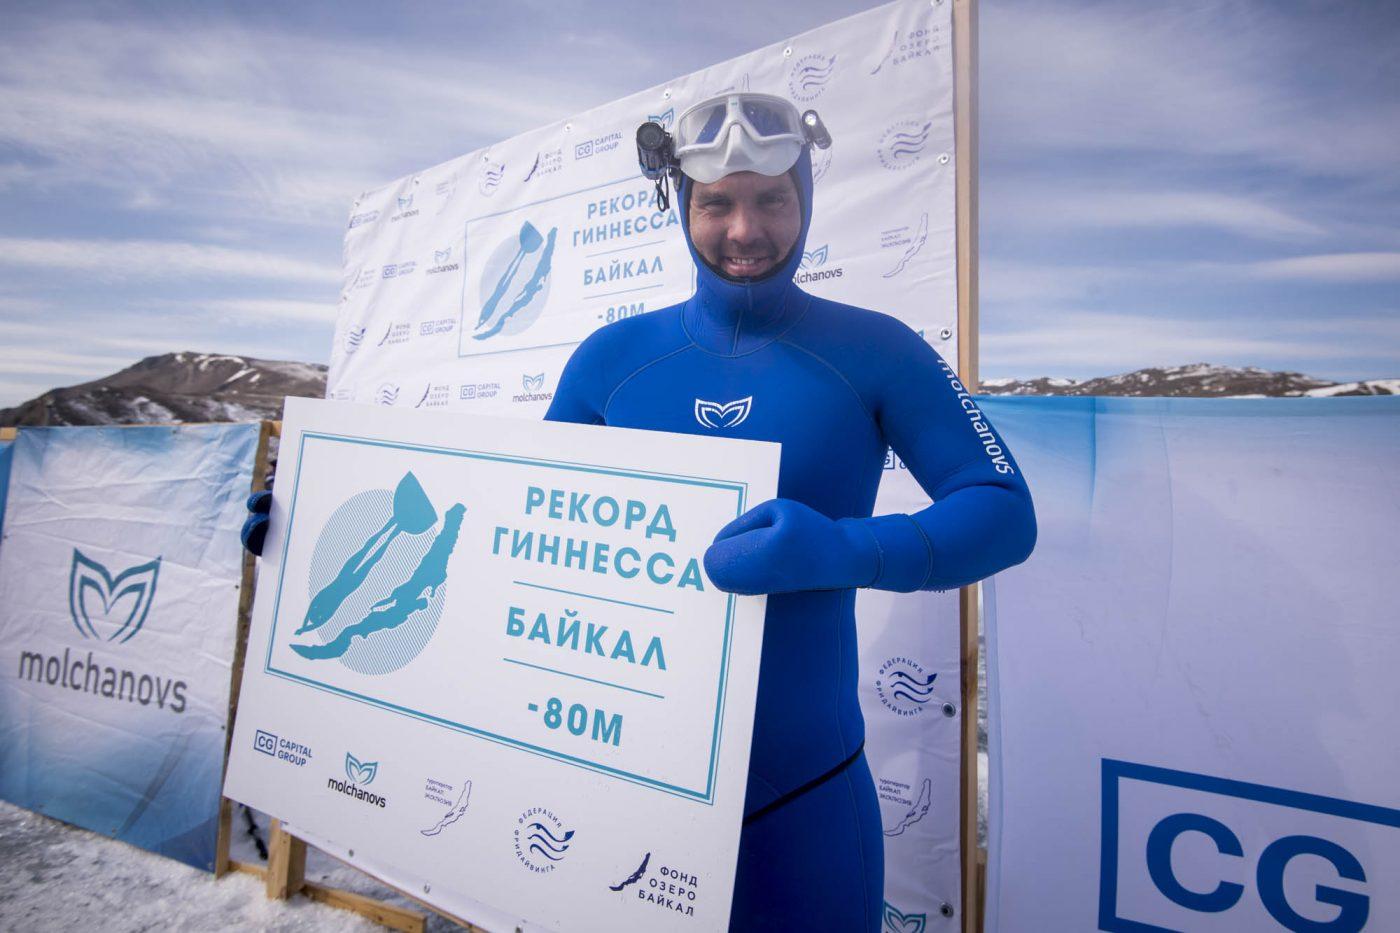 Alexey Molchanov set a new Guinness World Record